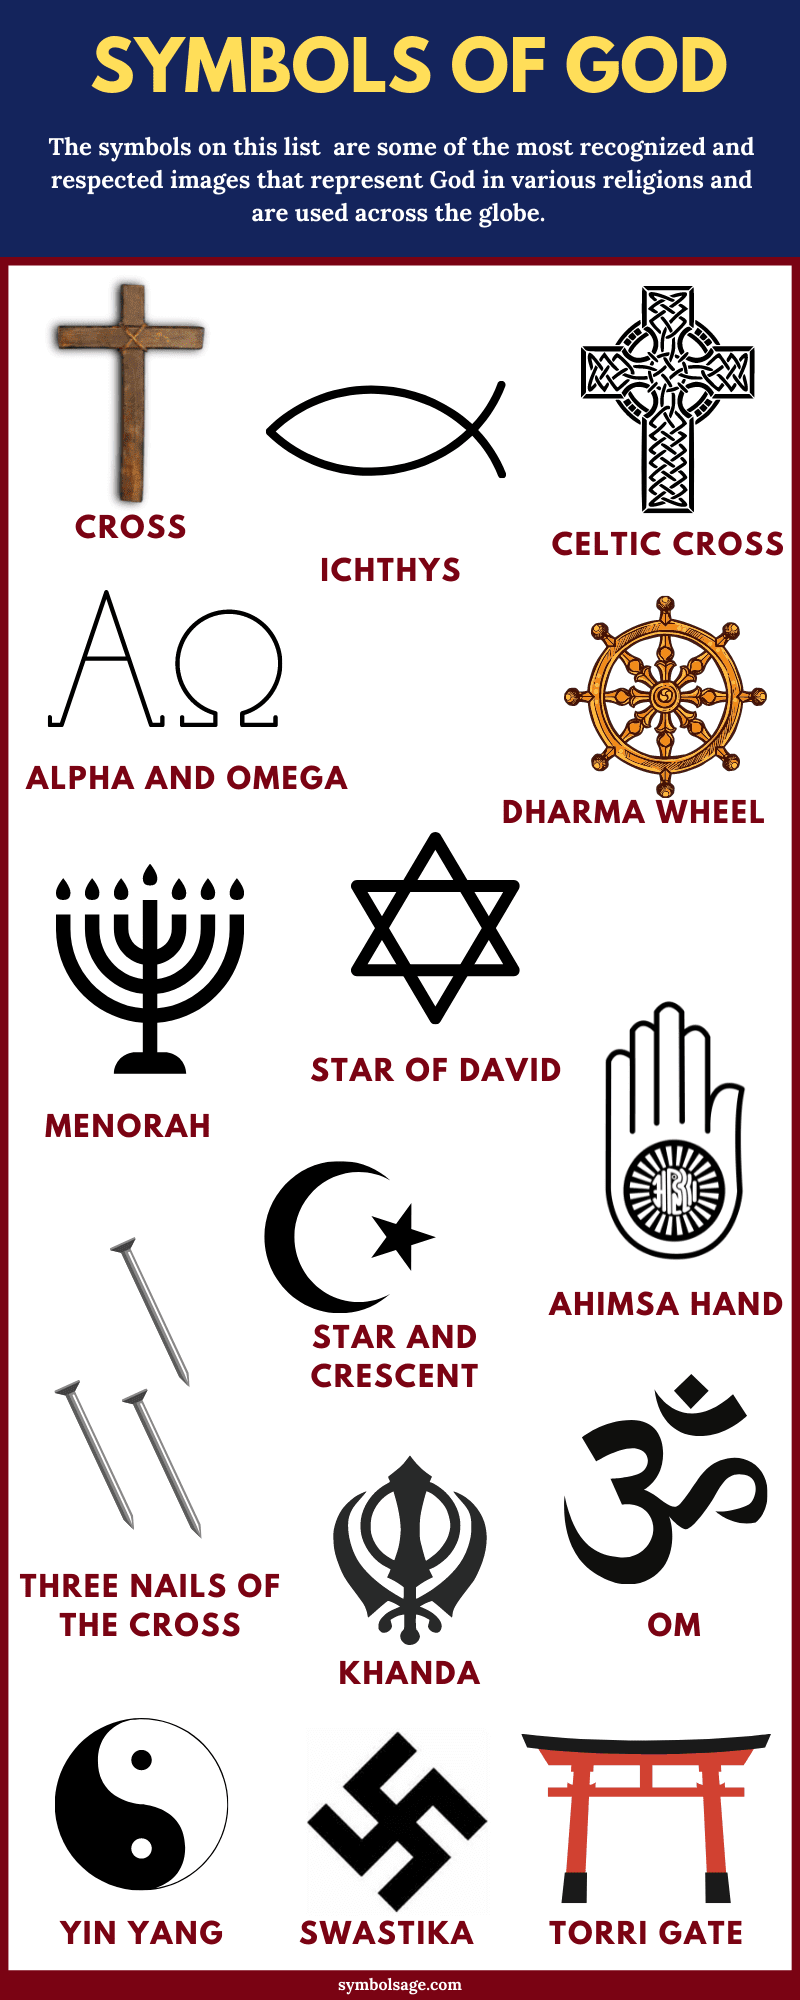 Symbols of god list